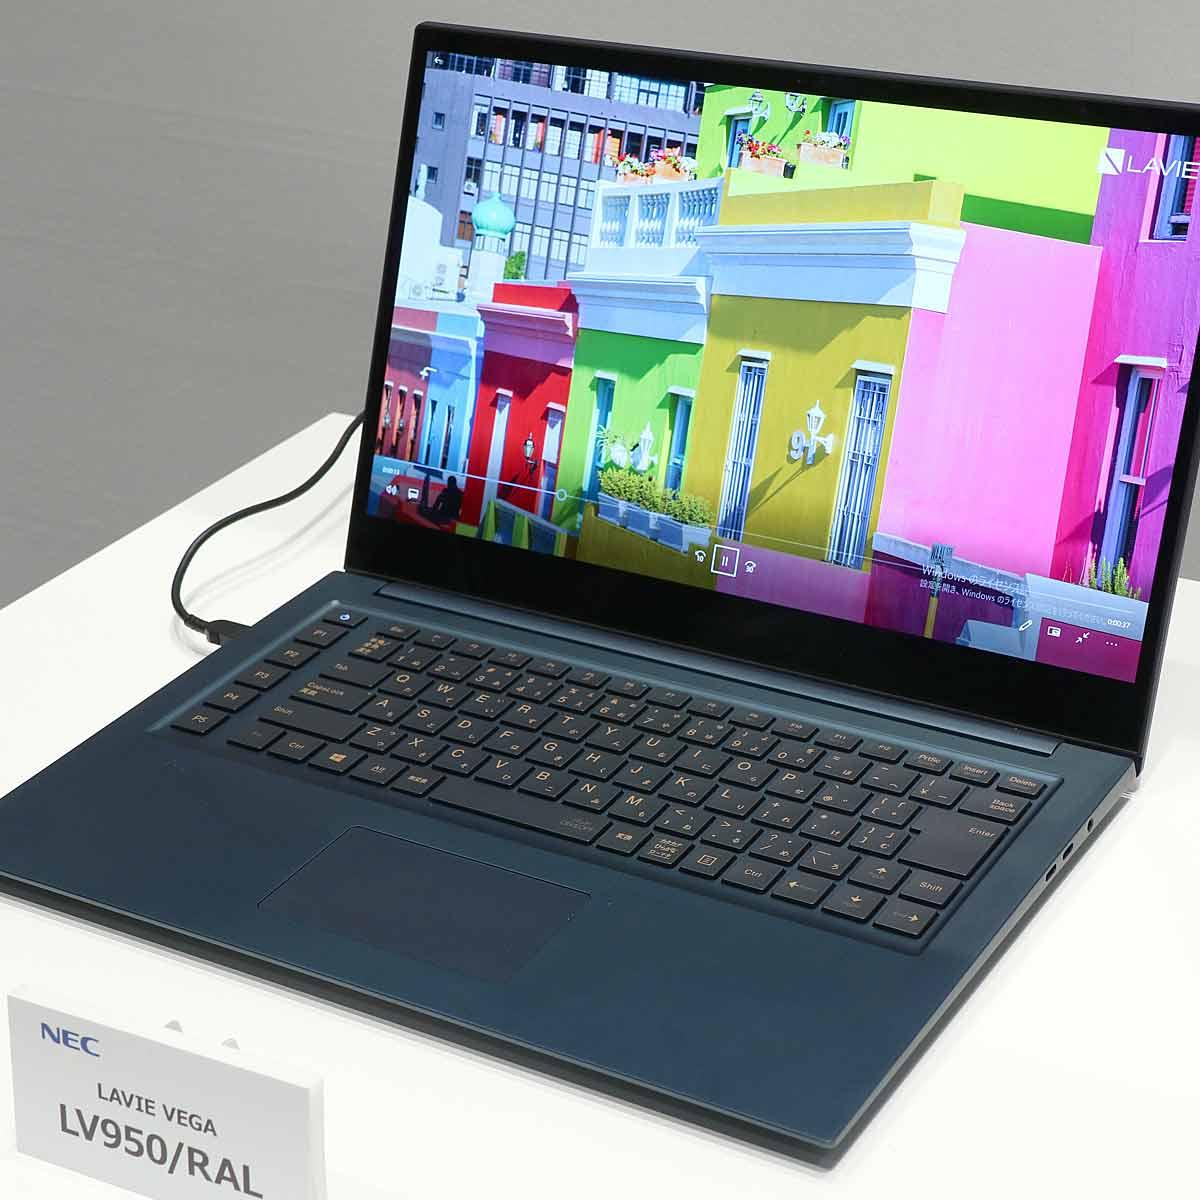 NEC、4K有機EL搭載の「LAVIE VEGA」など2020年春モデル発表